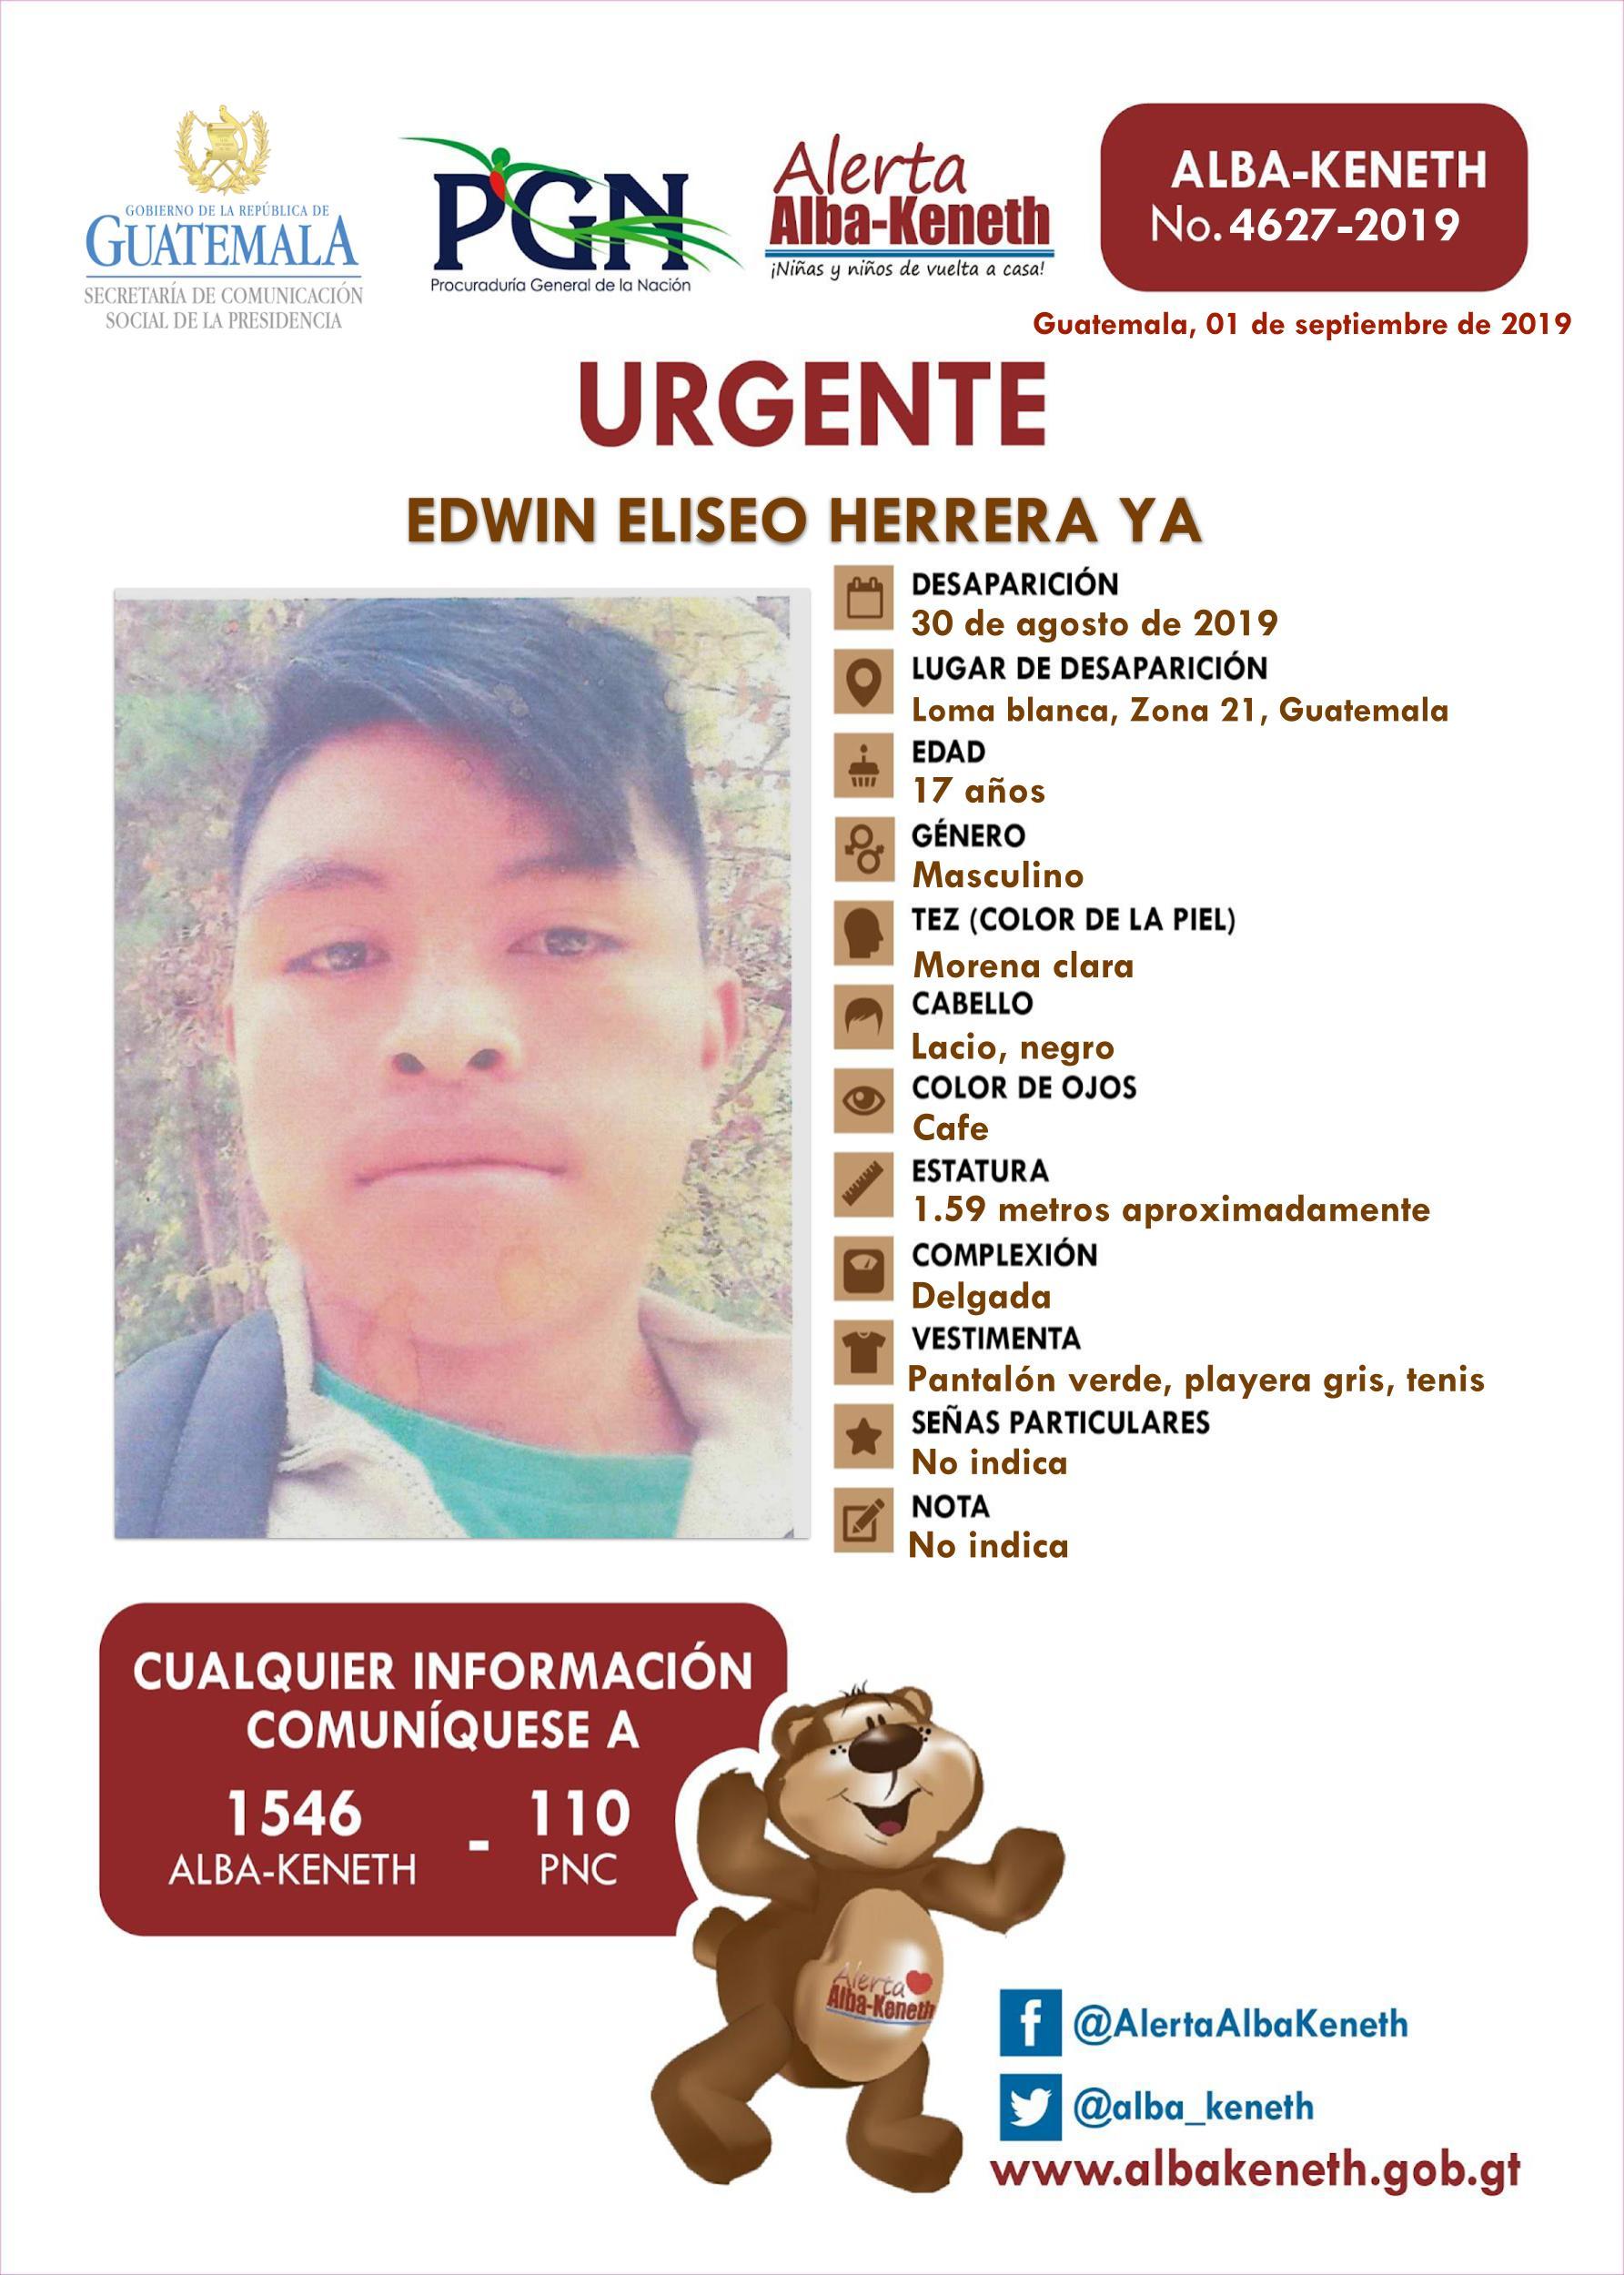 Edwin Eliseo Herrera Ya